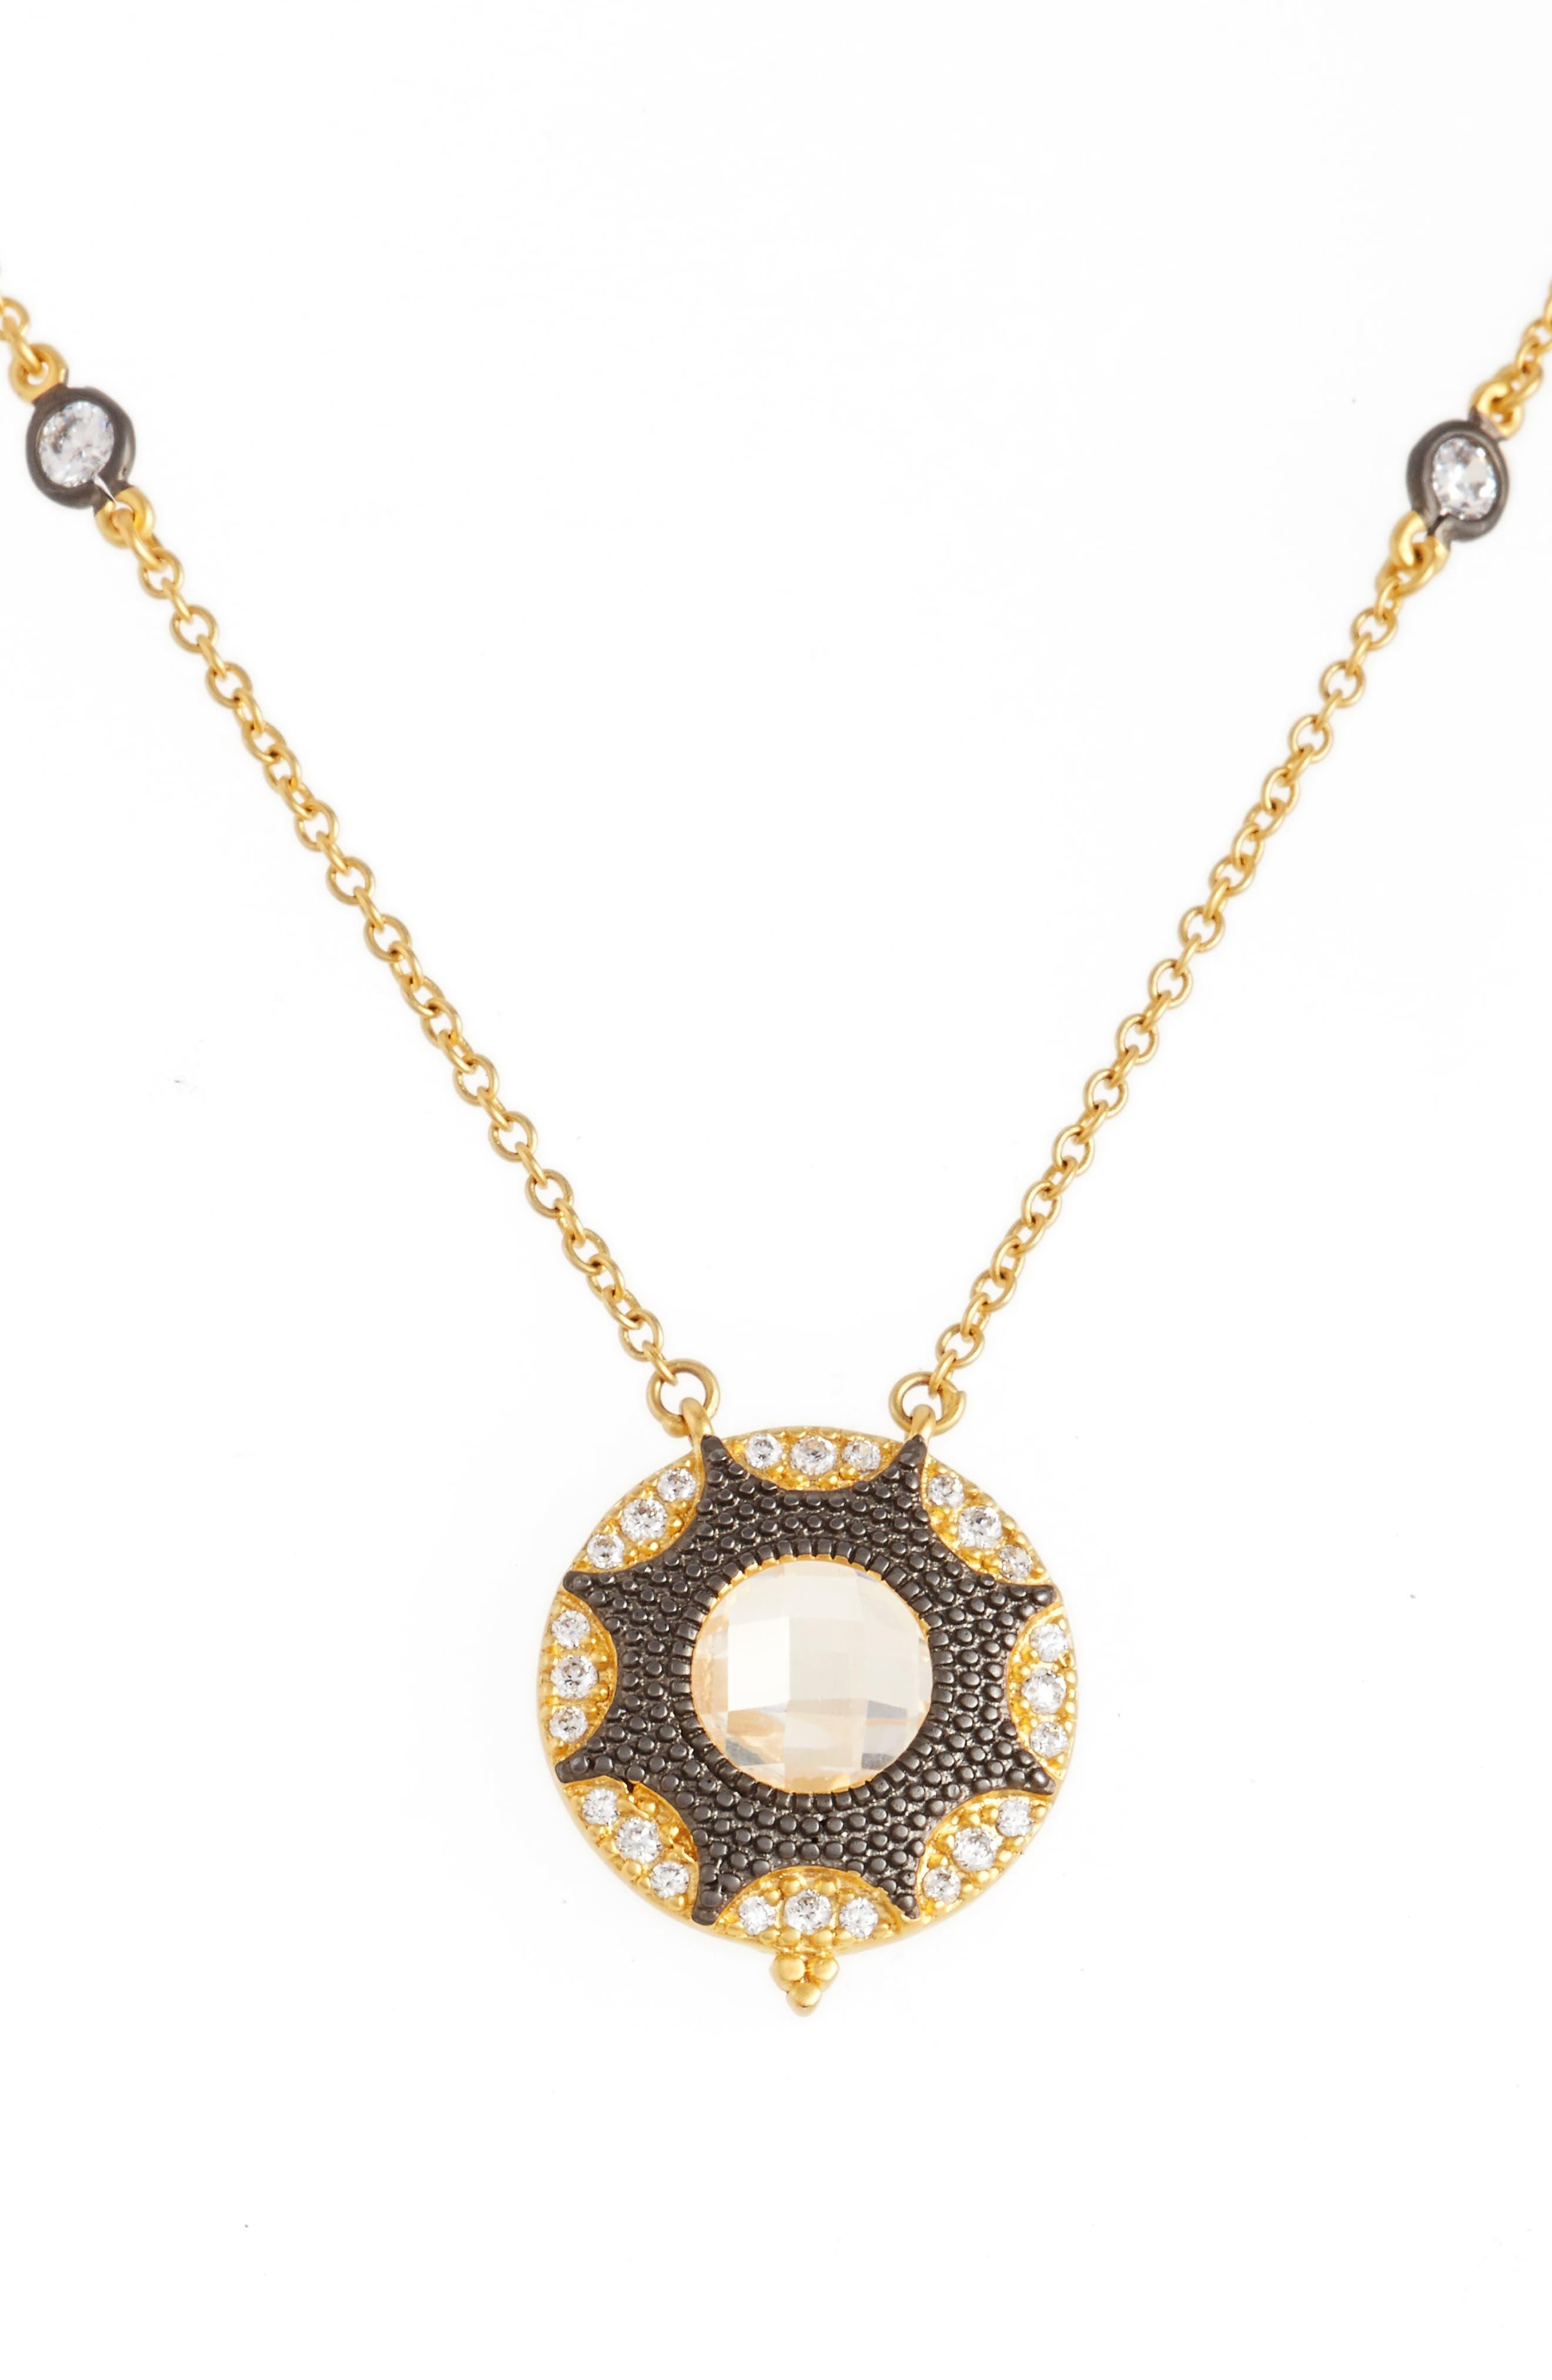 Round Pendant Necklace,                             Main thumbnail 1, color,                             710